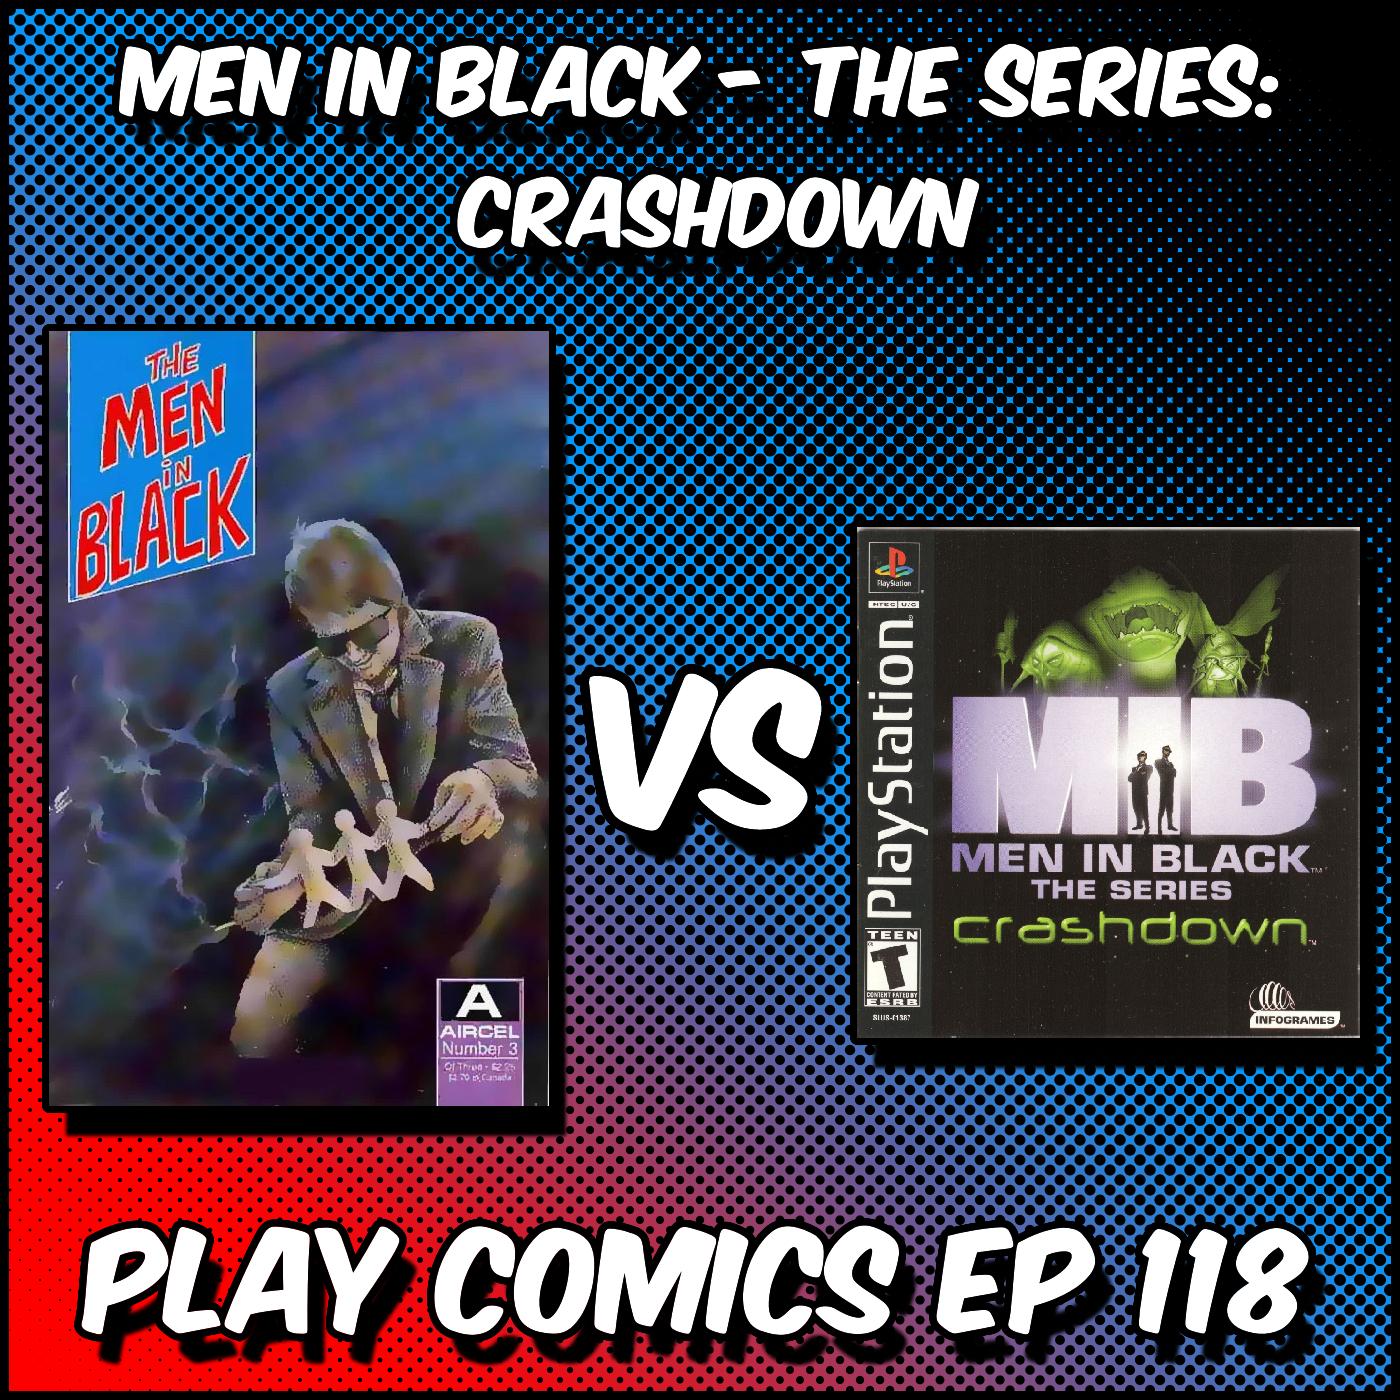 Men in Black Crashdown with Kristian Cabrera (Simping For Senpai)